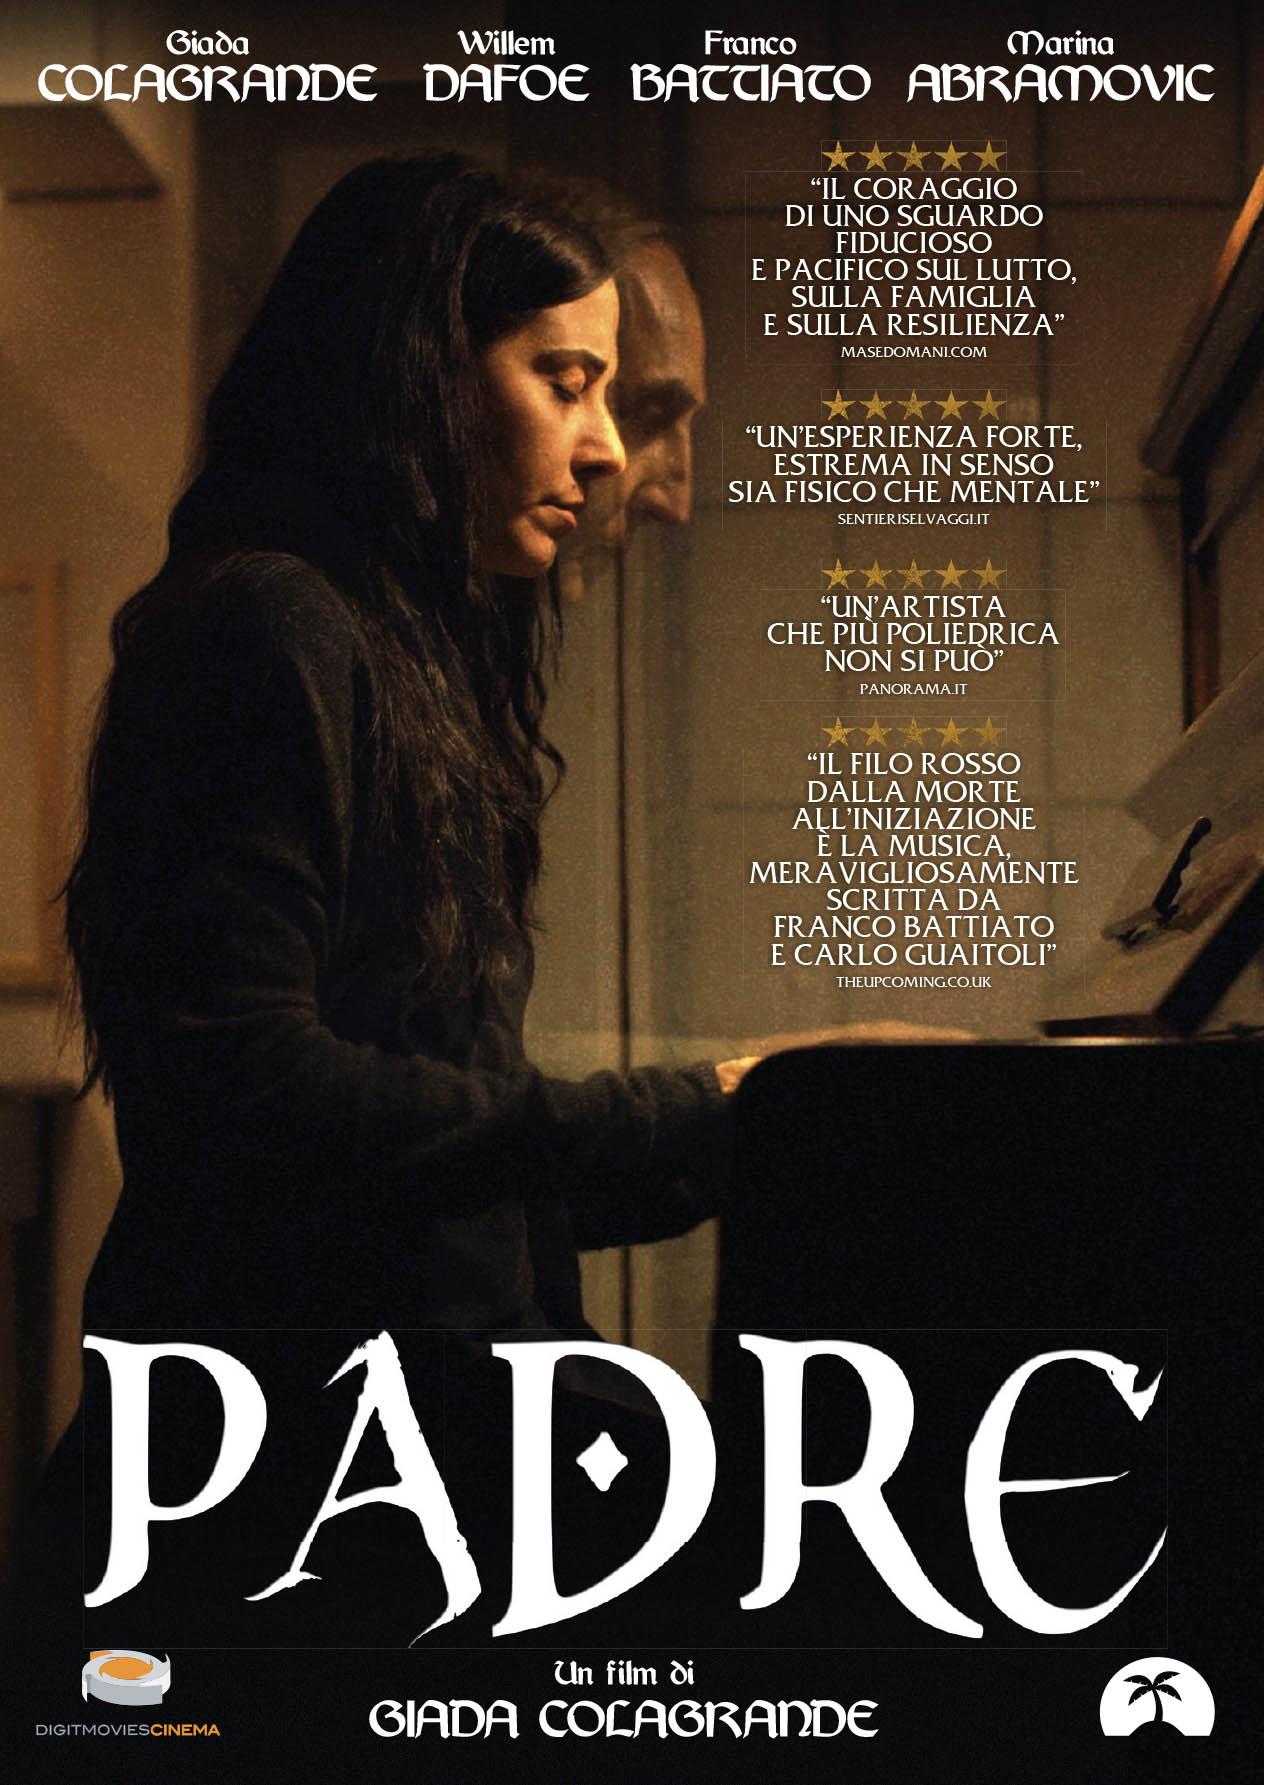 PADRE (DVD)